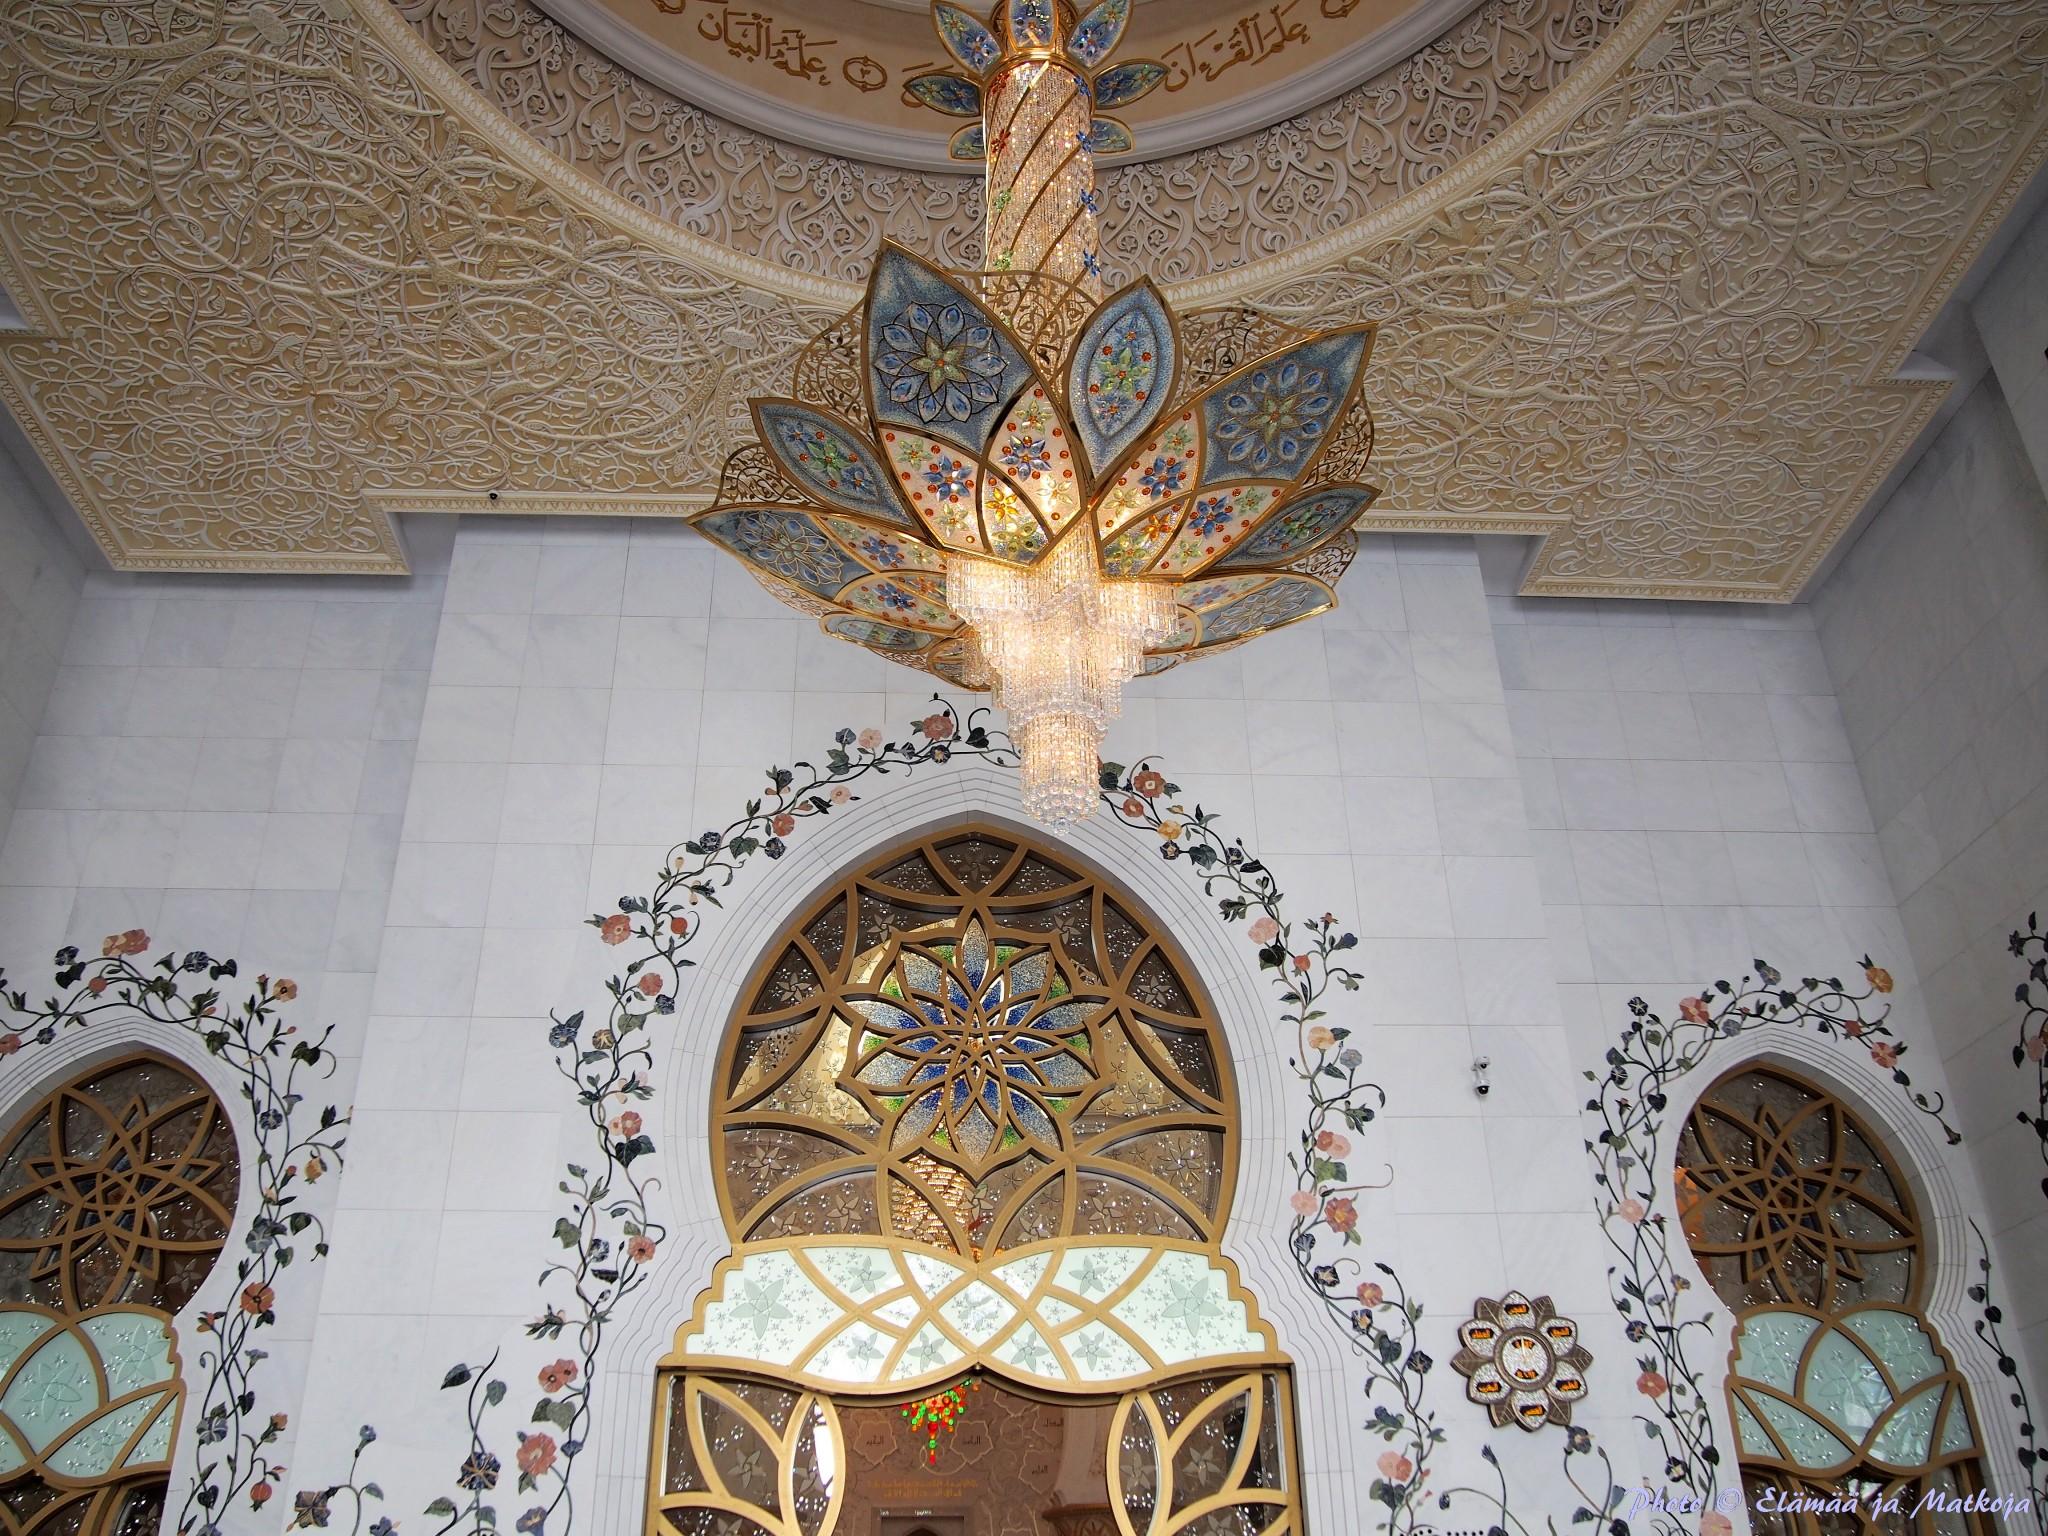 Sheikh Zayed Grand Mosque Abu Dhabi UAE 11 Photo © Elämää ja Matkoja